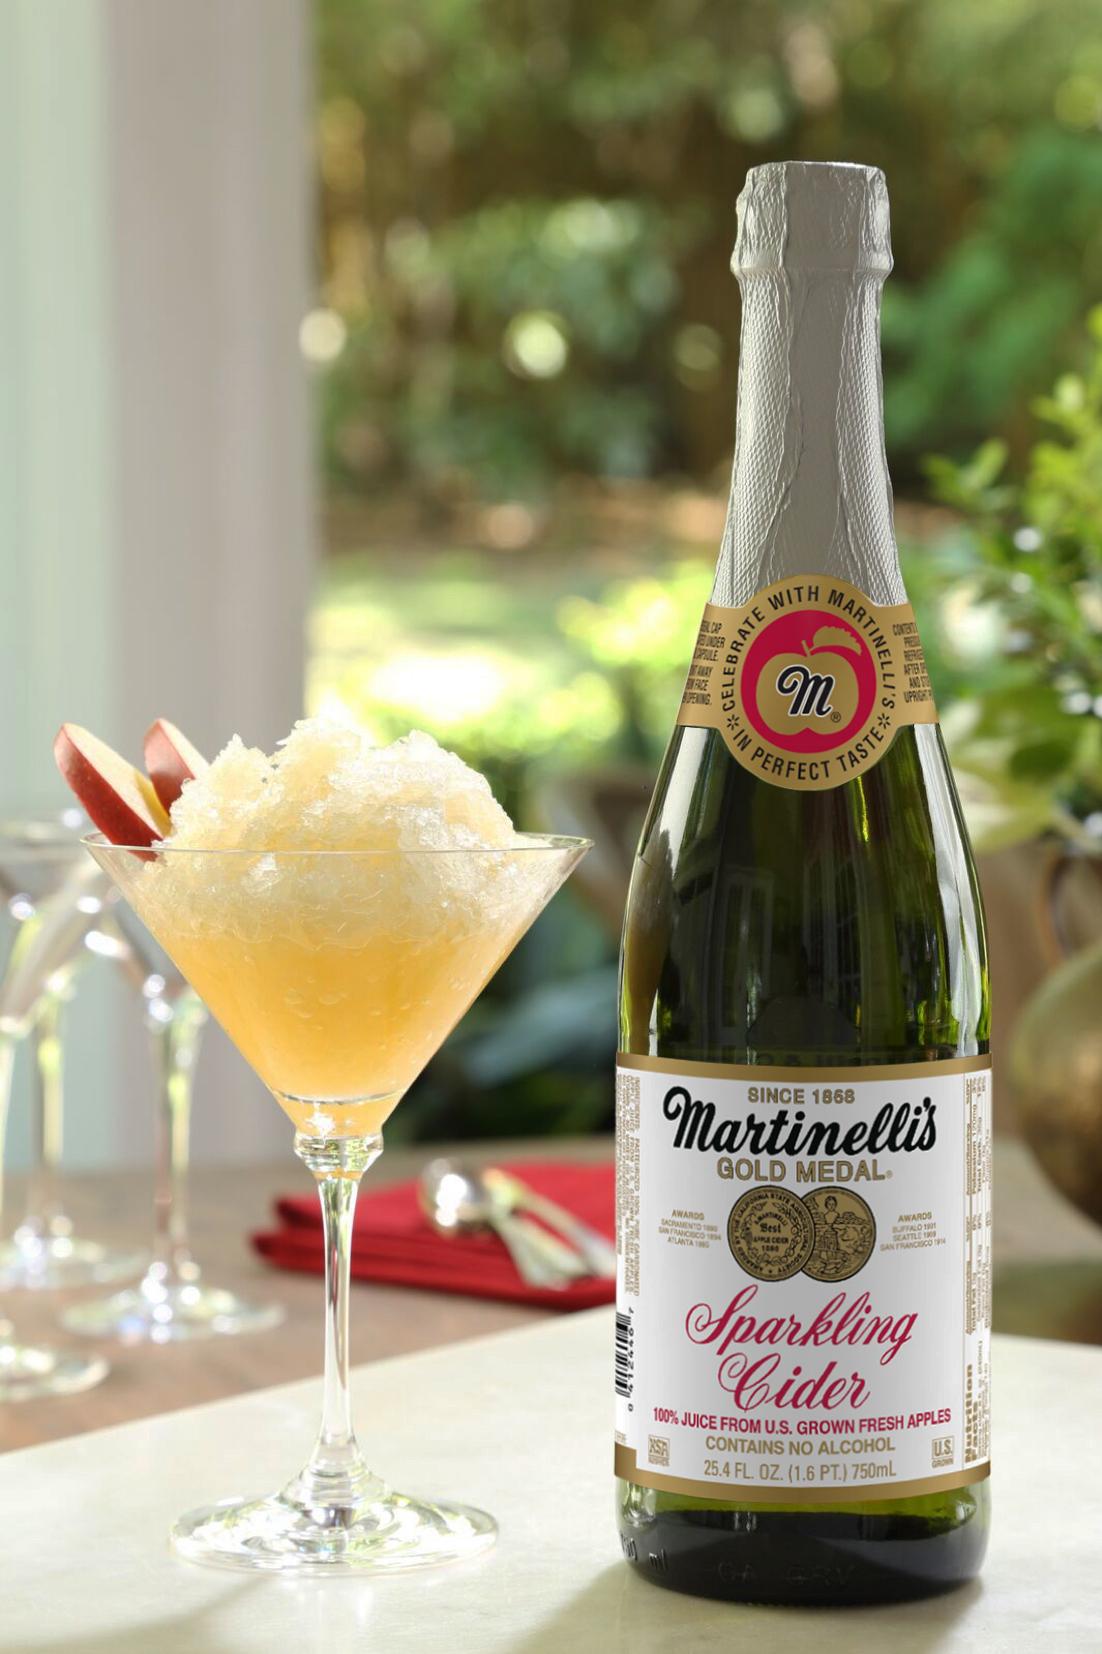 Martinellis-Sparkling-Apple-Granita